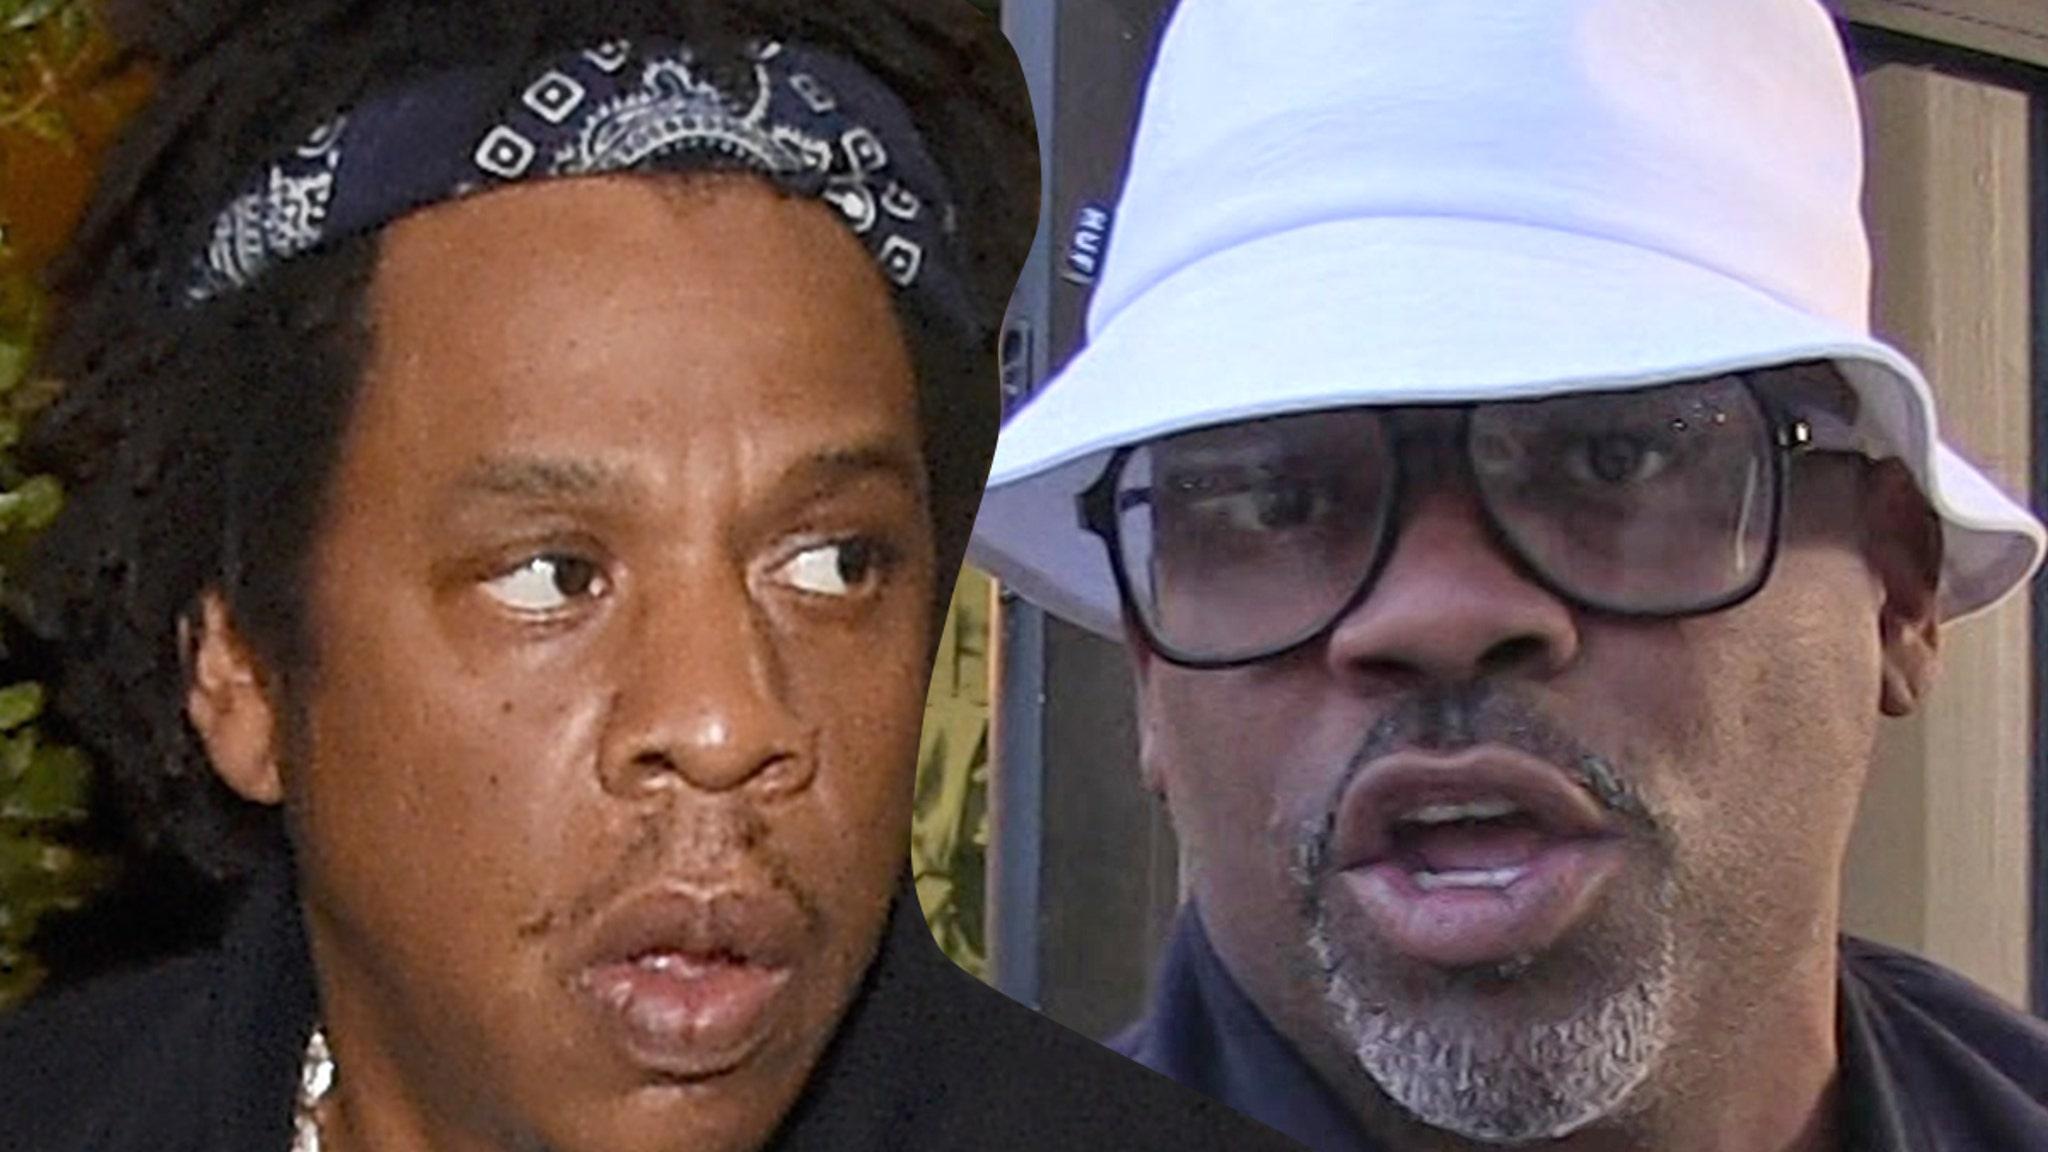 Roc-A-Fella Sues Damon Dash Over 'Reasonable Doubt' NFT - TMZ